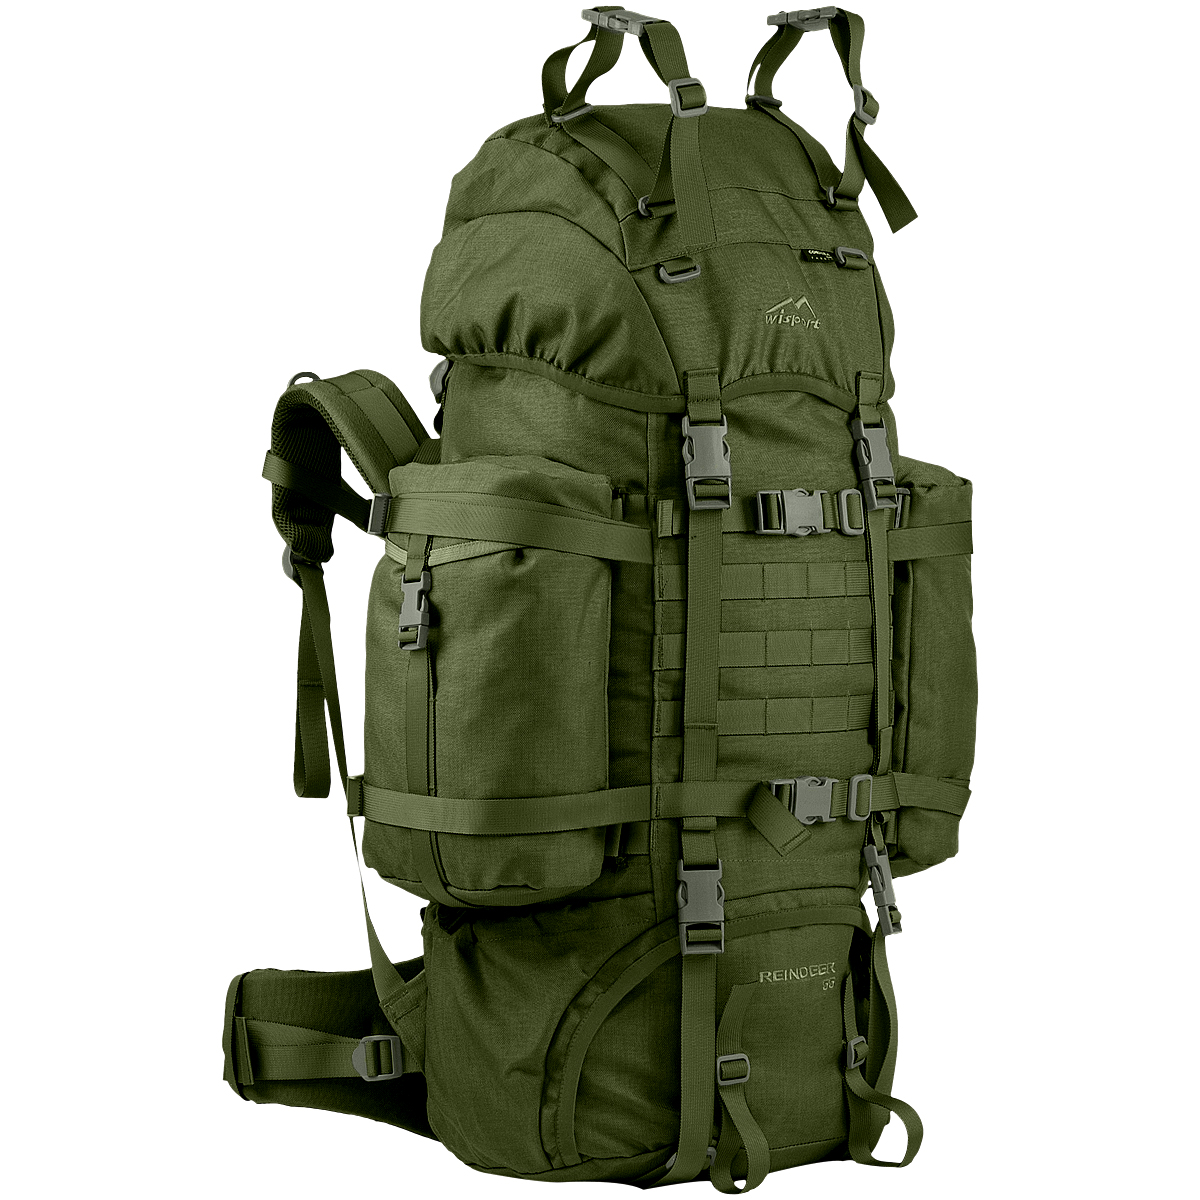 Olive 75L ARMY RANGER RUCKSACK Military Style Camping Hiking Patrol Backpack Bag